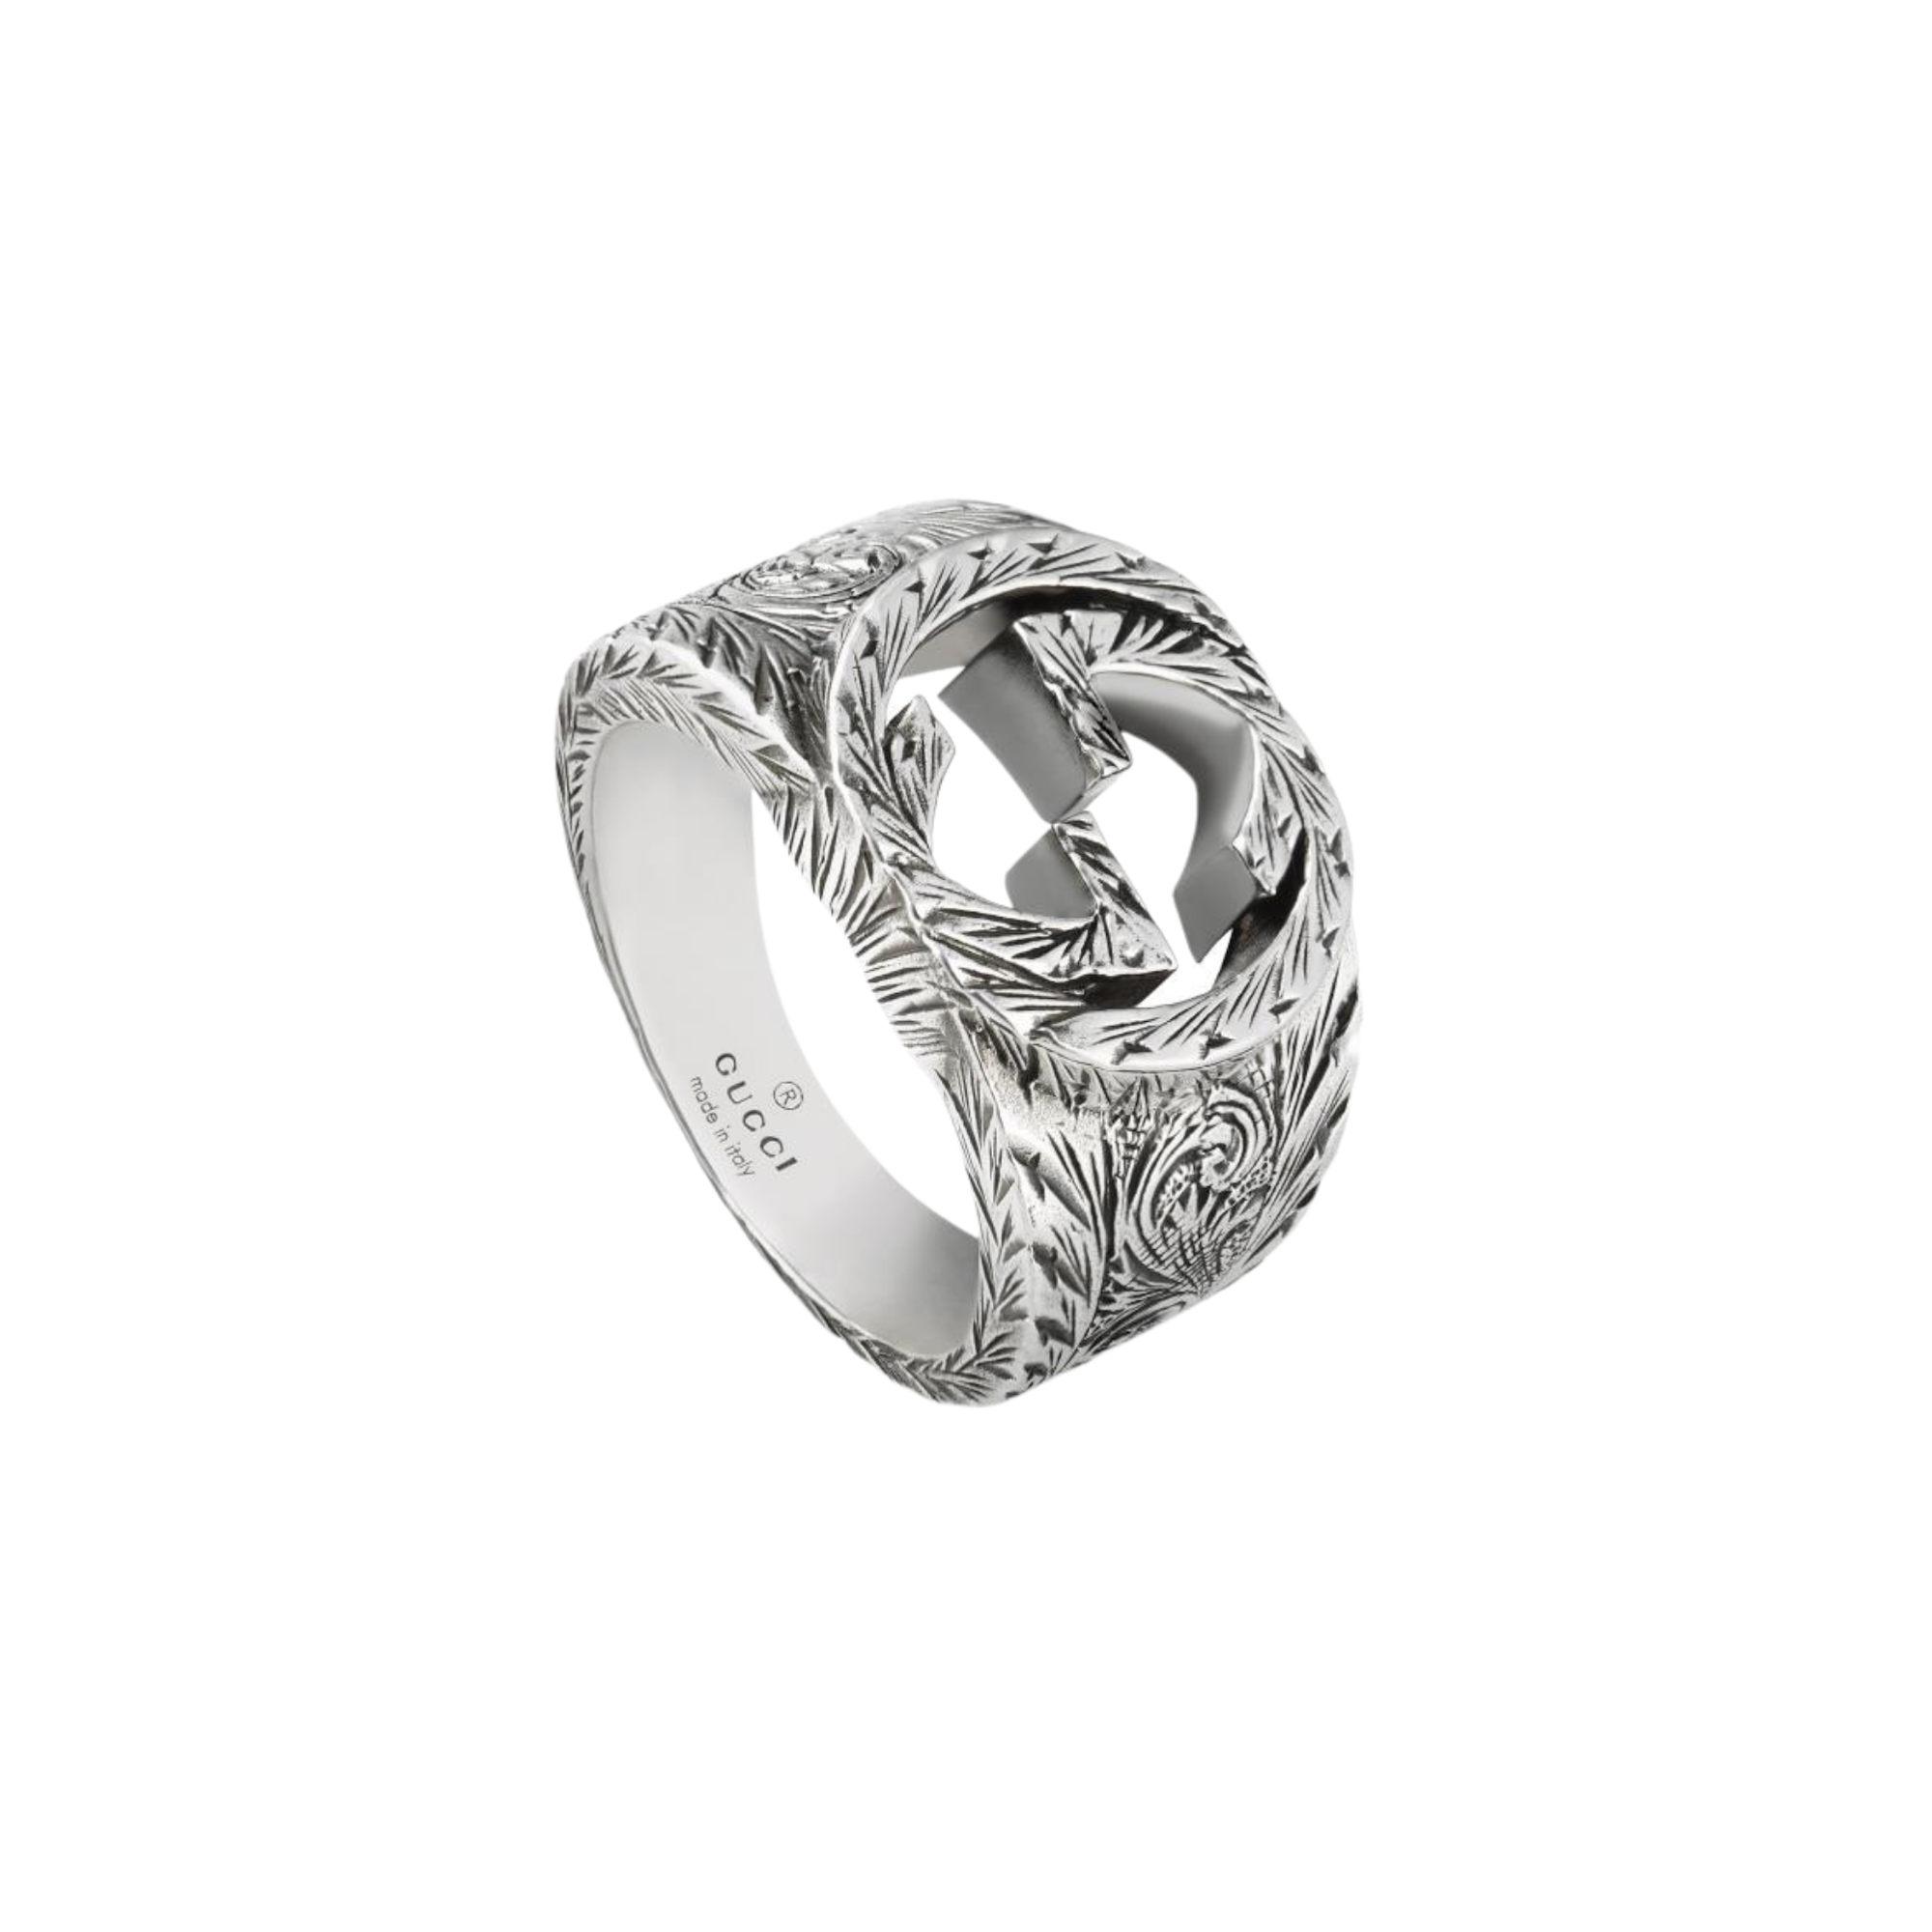 YBC455302001 anello gucci gg argento silver ring sconto discount